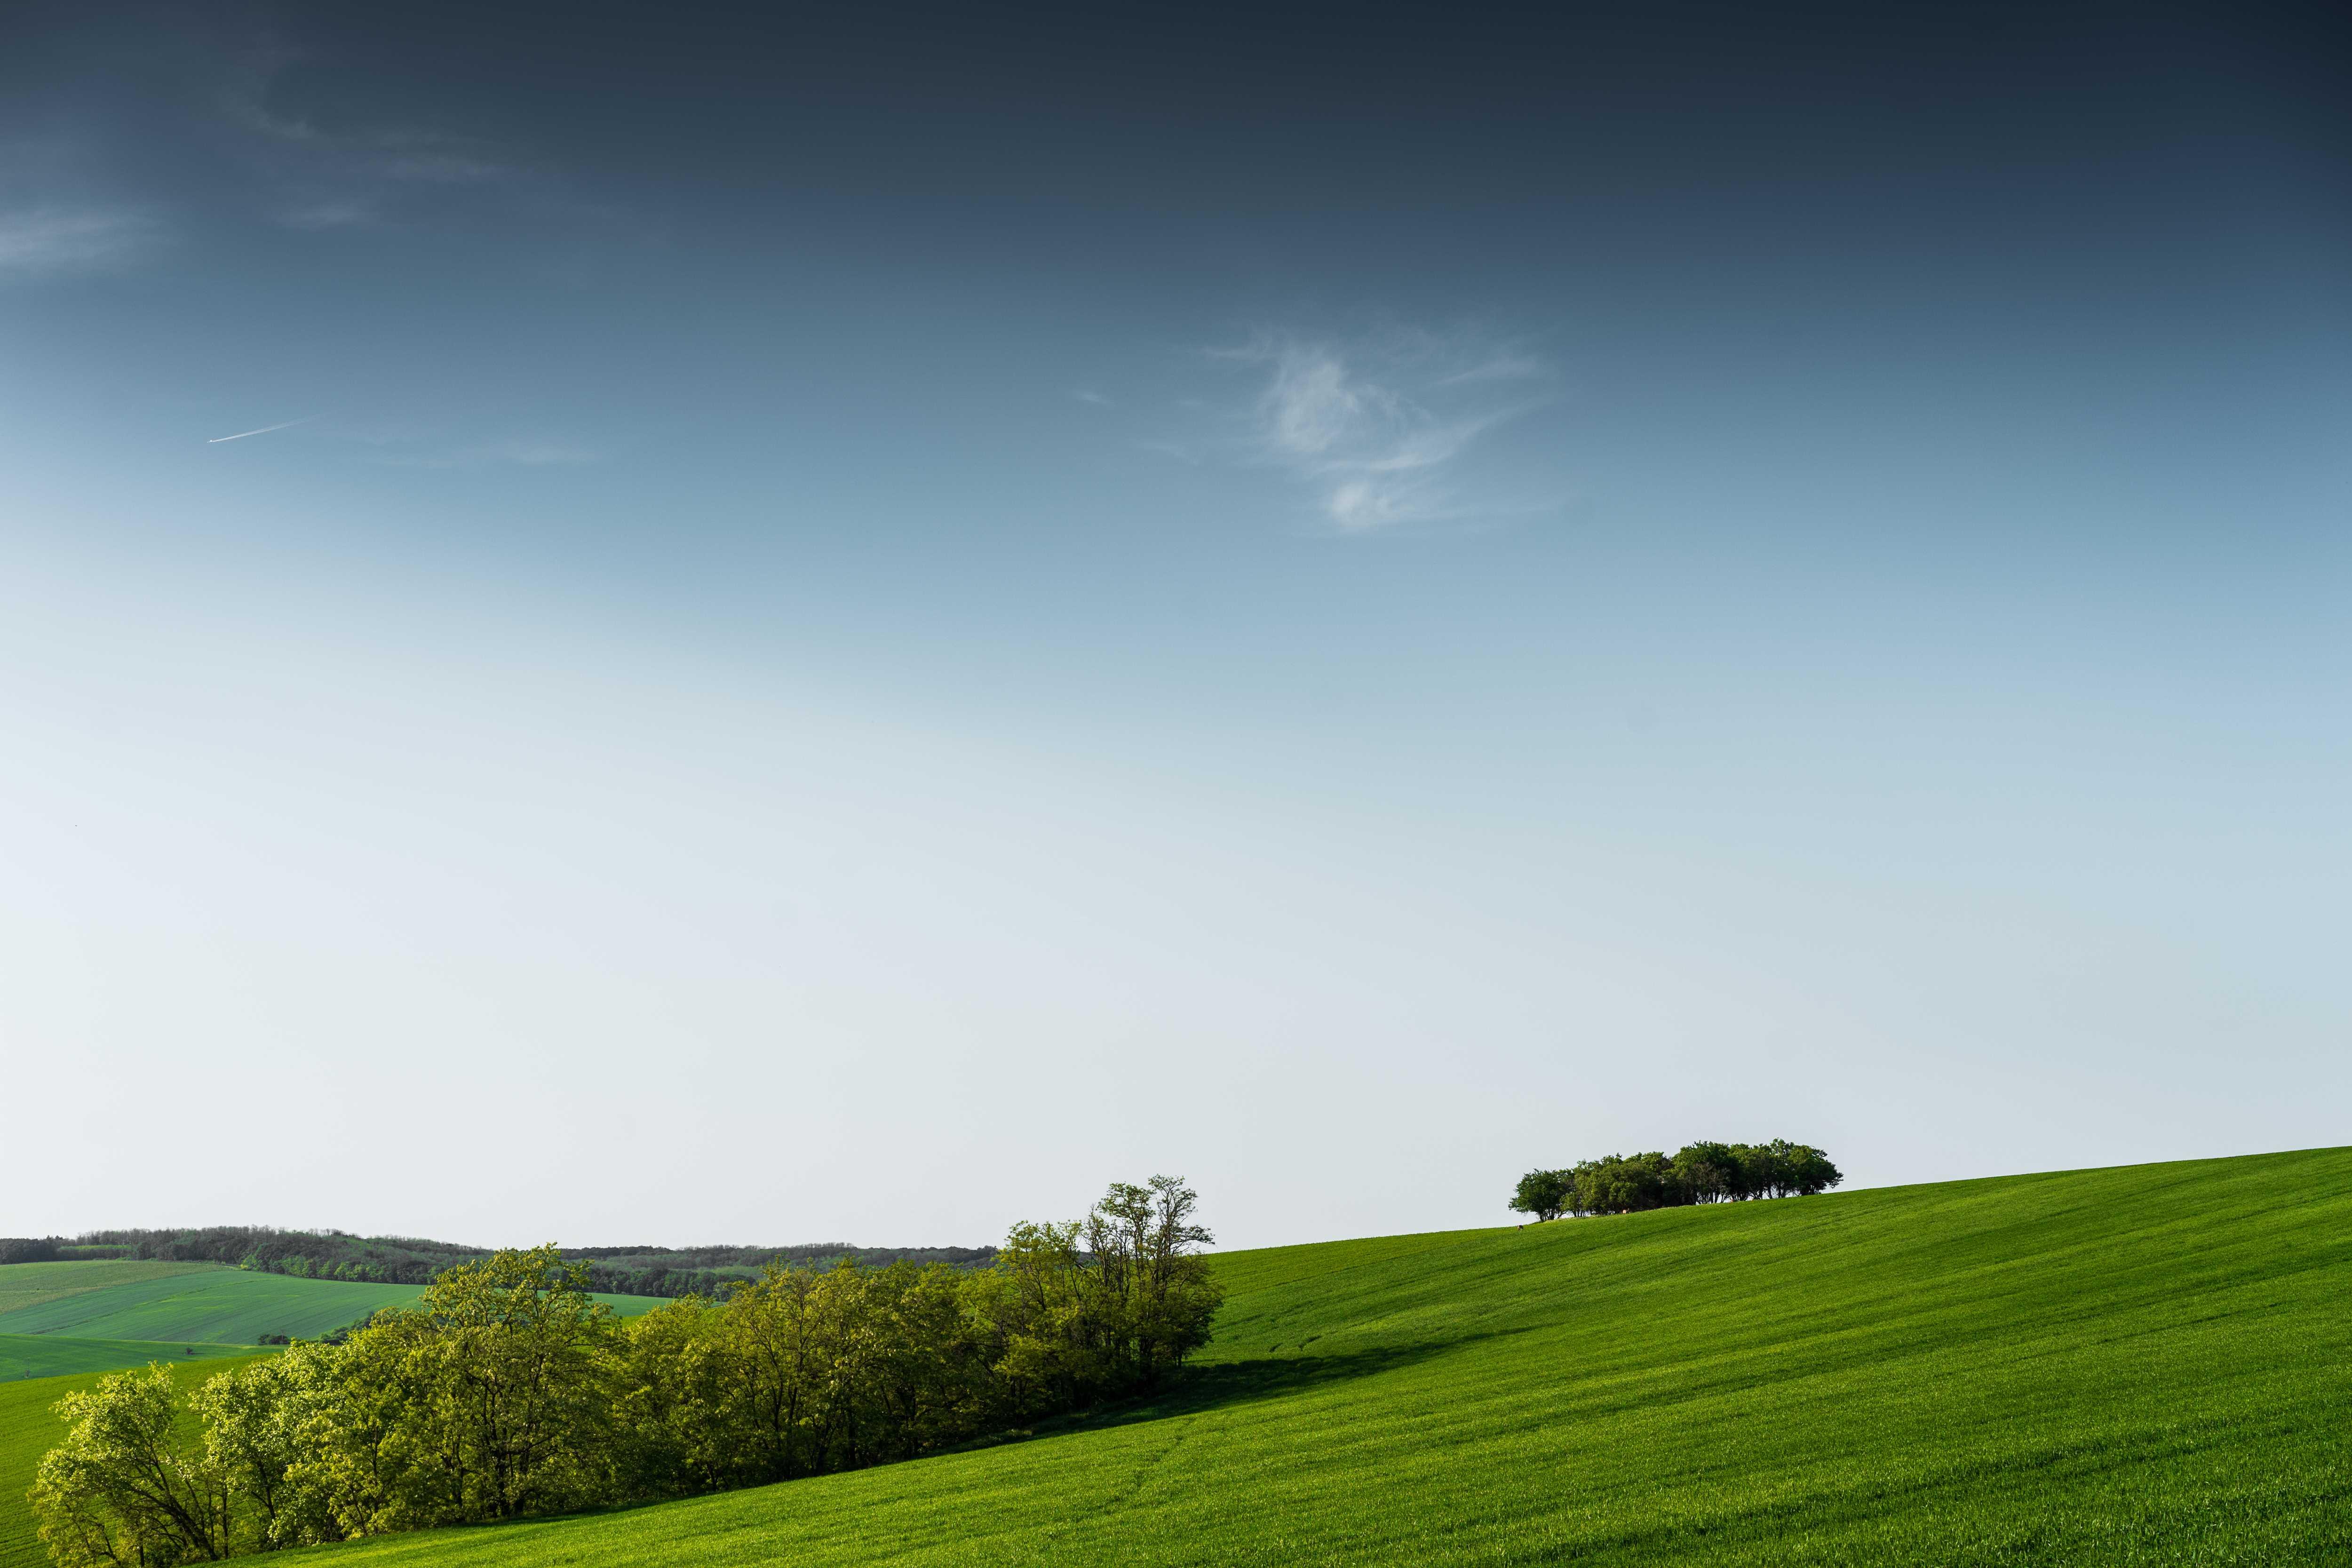 minimalistic-green-scenery-with-blue-sky-picjumbo-com